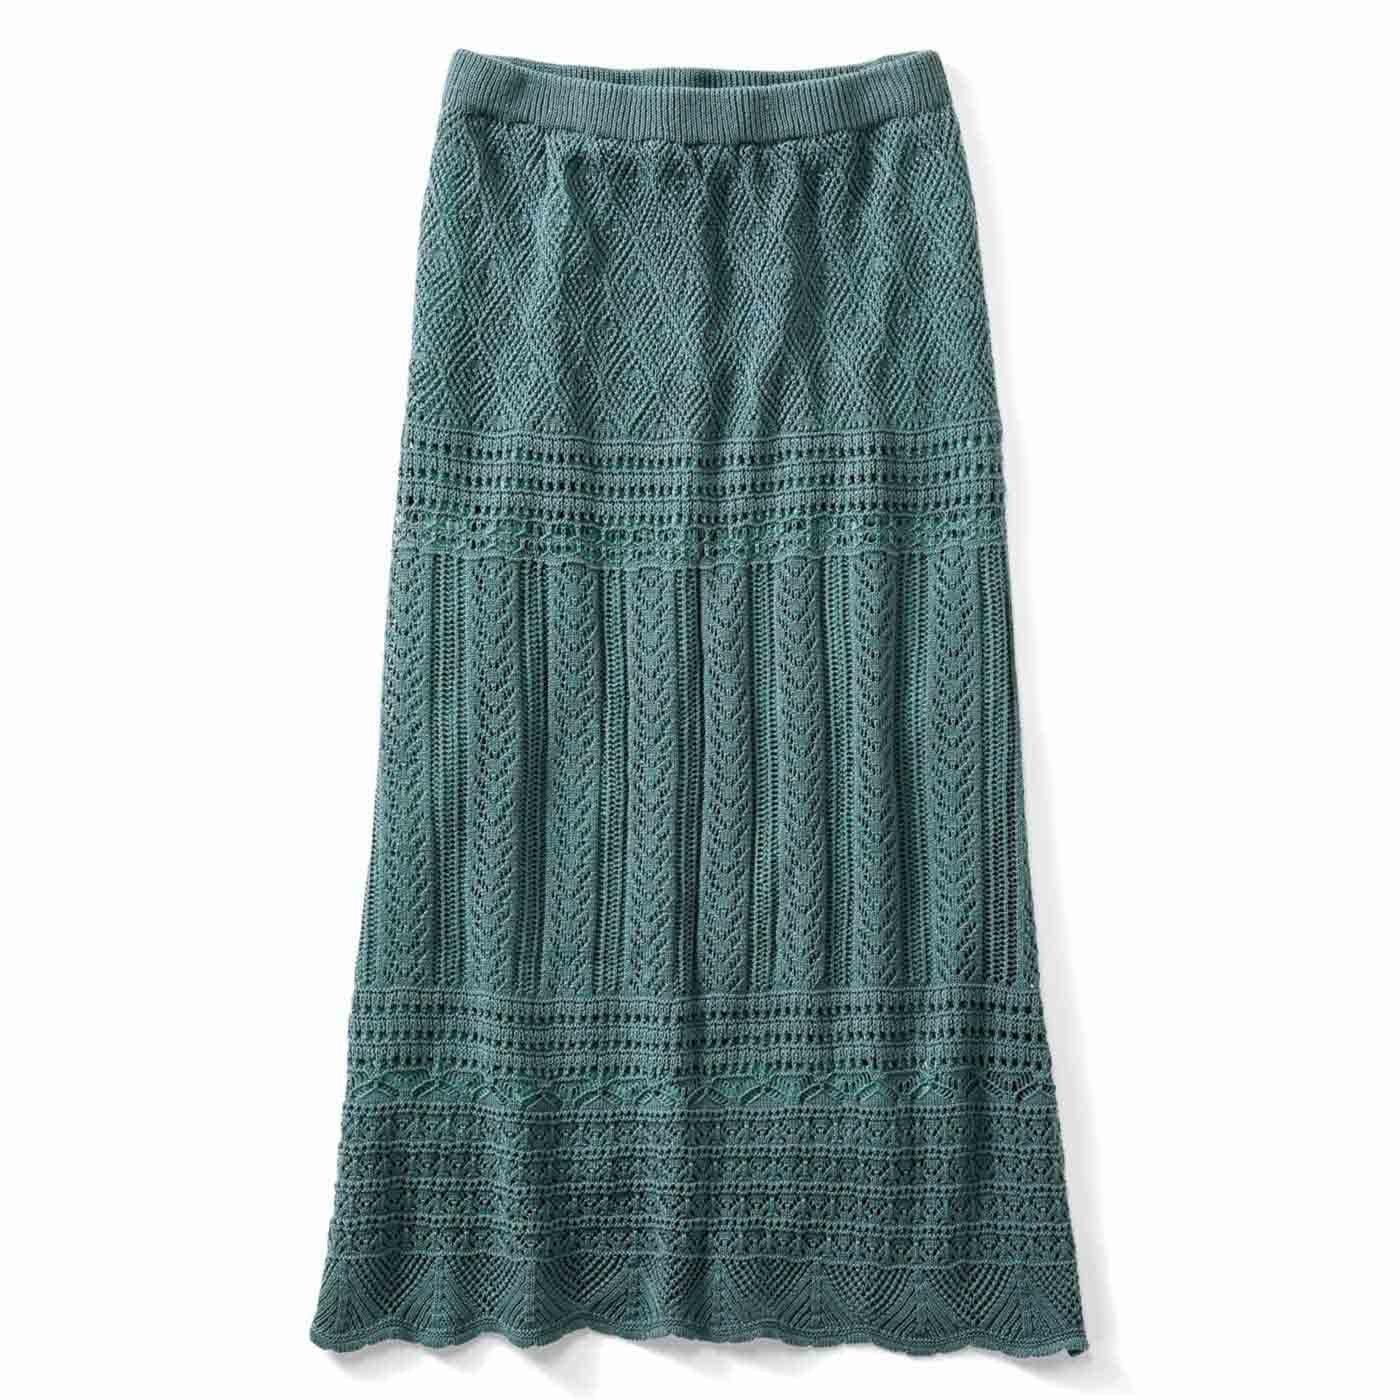 IEDIT[イディット] クロシェ編み風ロングニットスカート〈グリーン〉